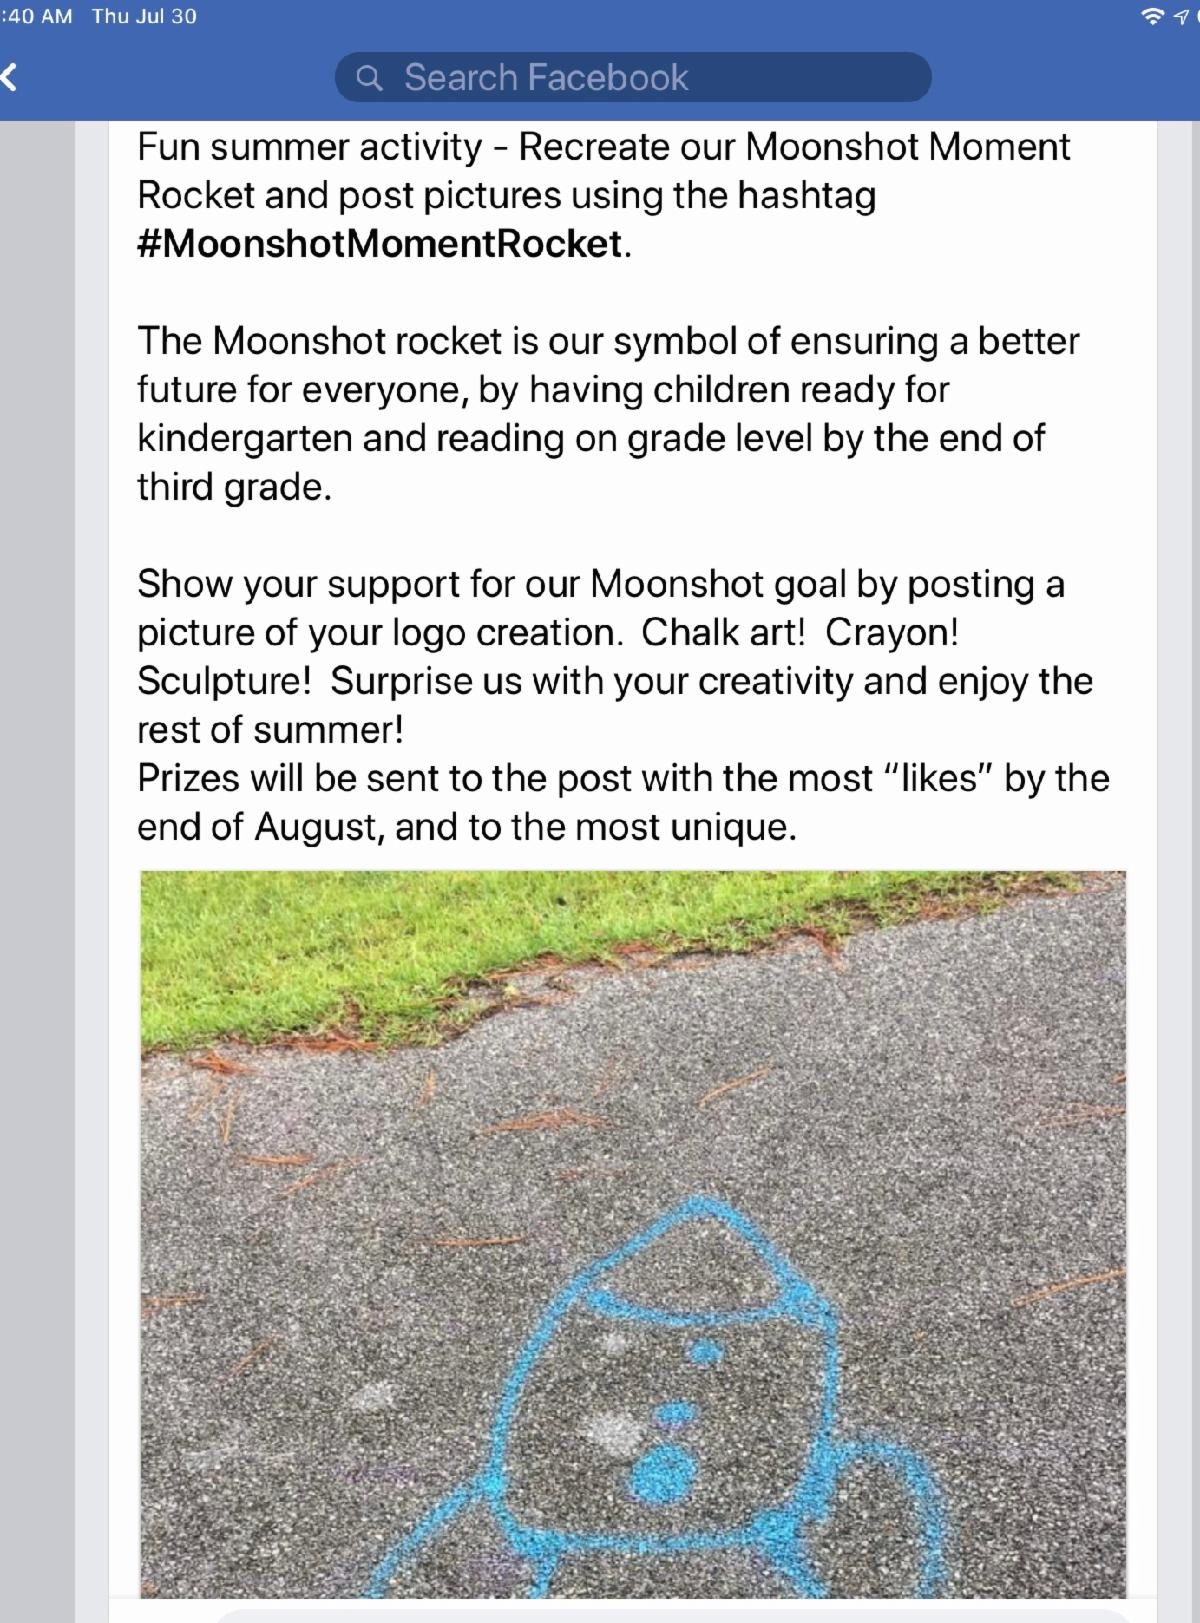 Rocket picture social media